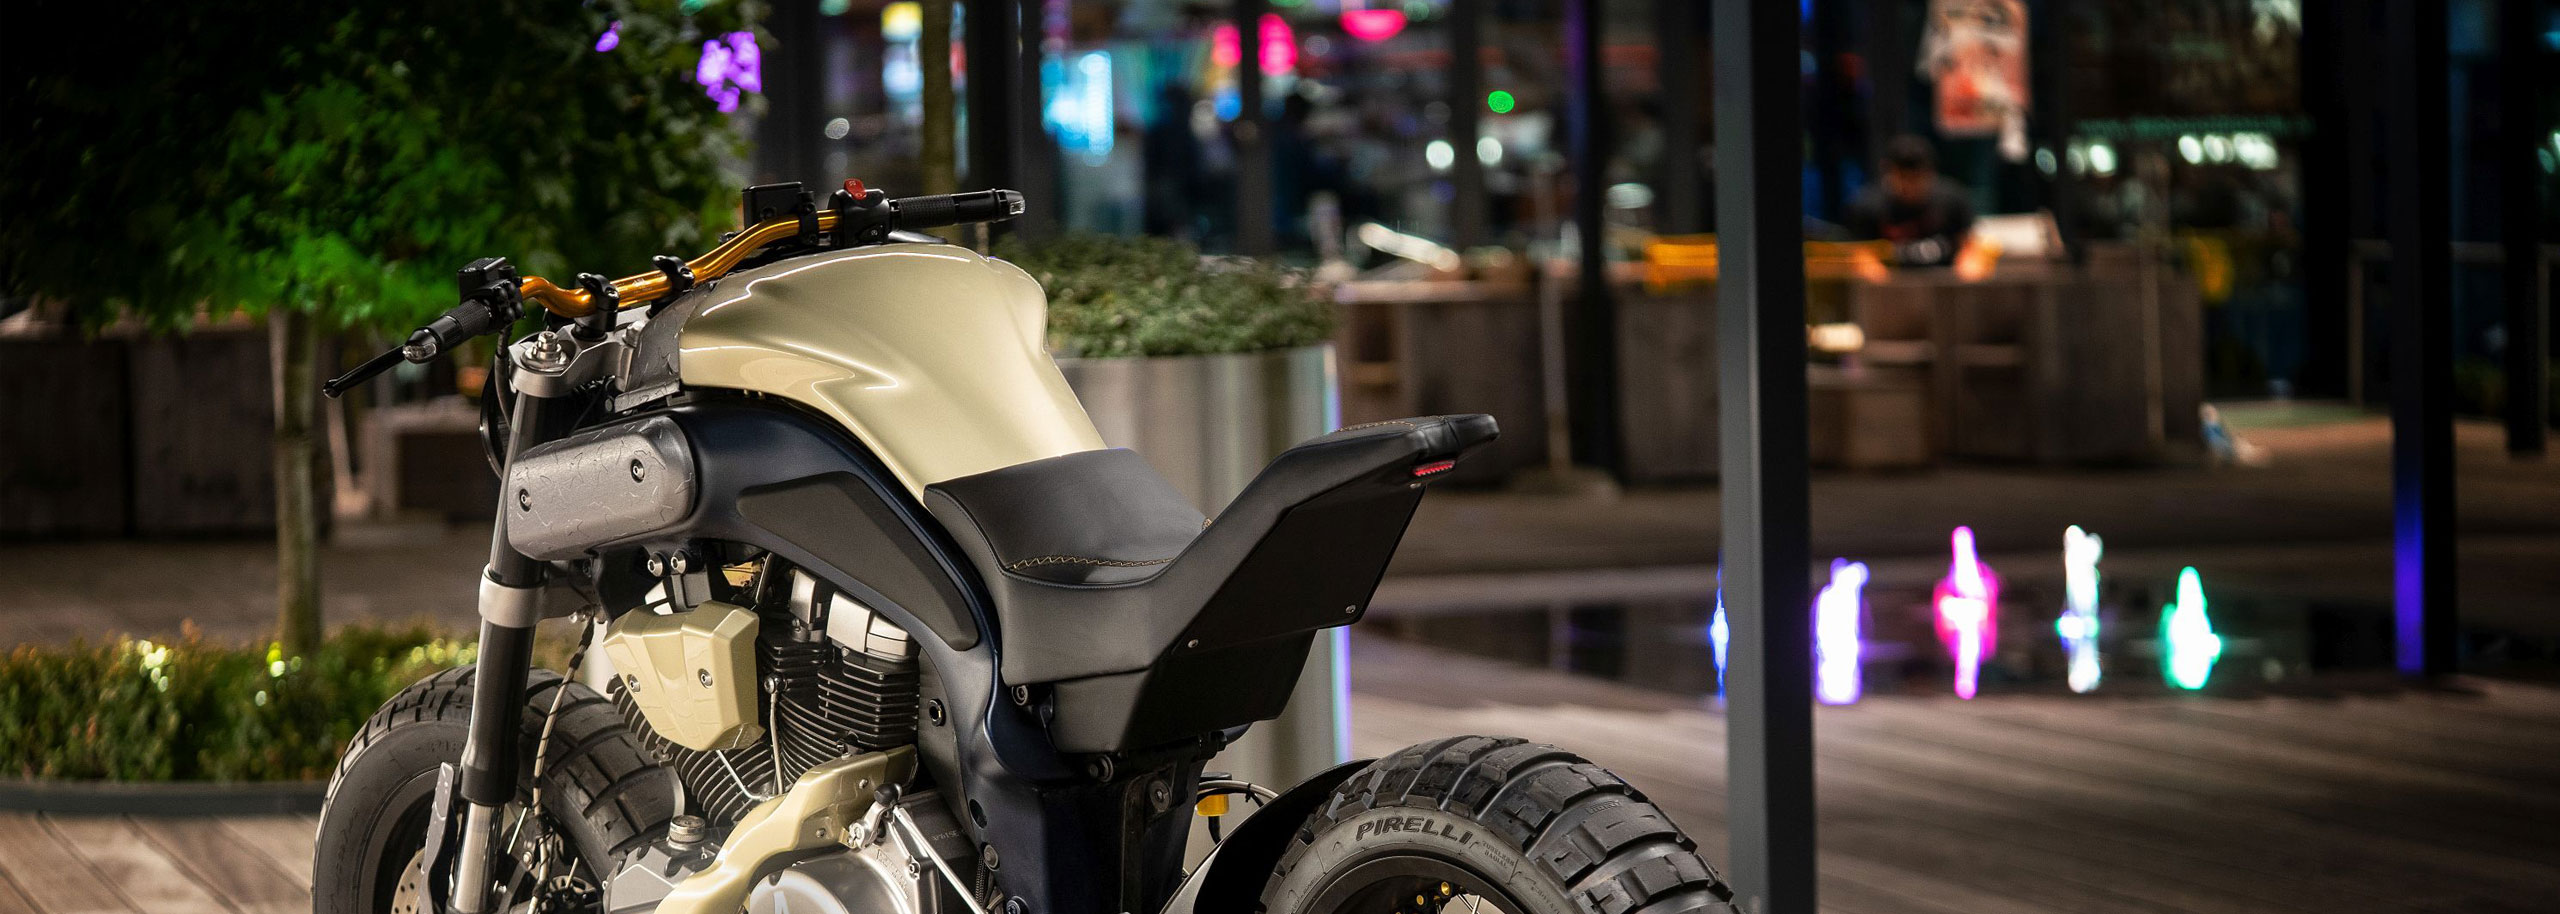 TITAN-Motorcycle-Cafe-Racer-Austria-Custom-Bike-Styria-Yamaha-MT-01_02